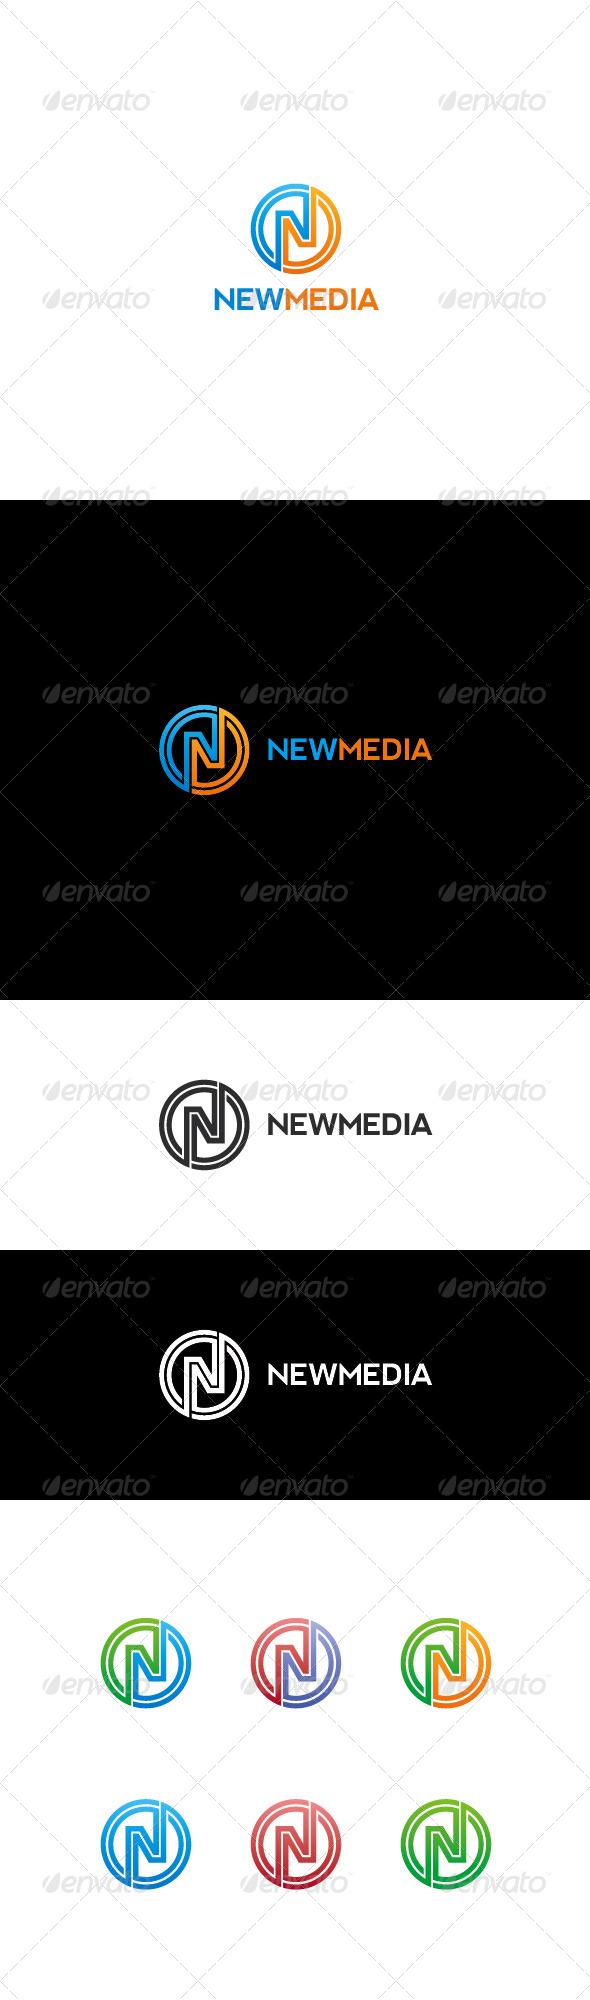 GraphicRiver N Letter Logo Newmedia 7010539